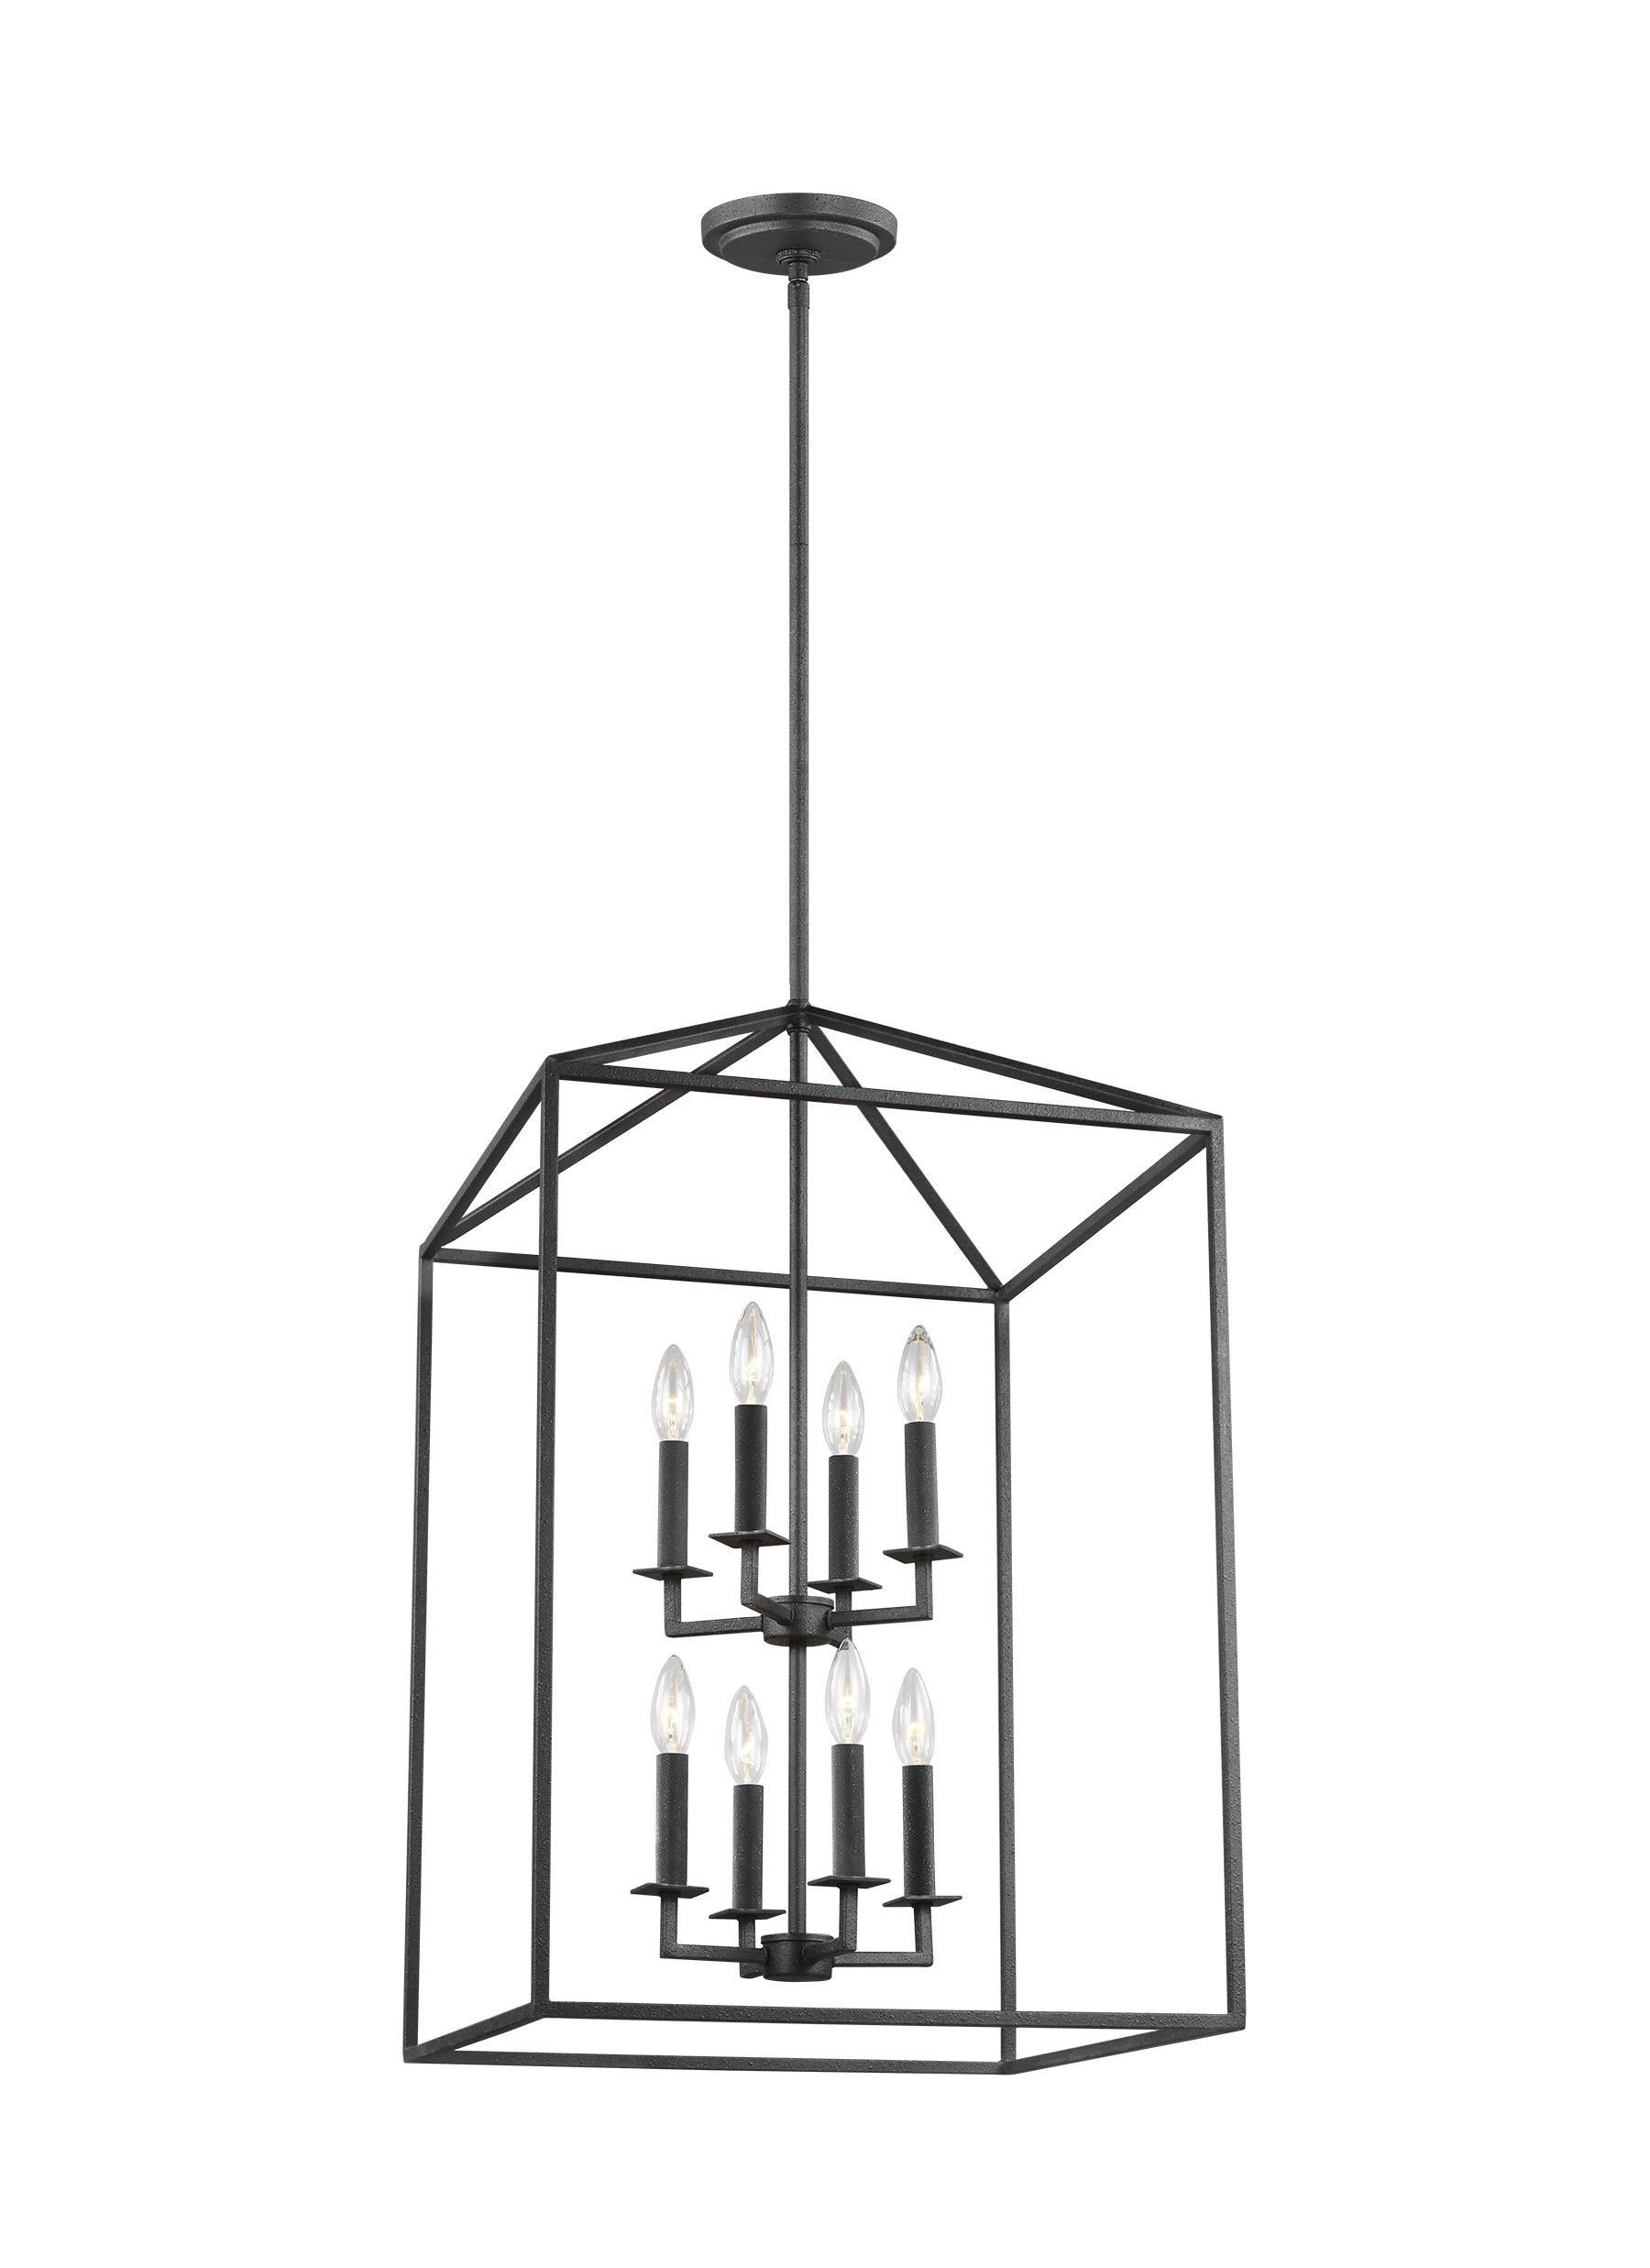 Odie 8 Light Lantern Tiered Pendant Inside Carmen 8 Light Lantern Tiered Pendants (View 8 of 30)